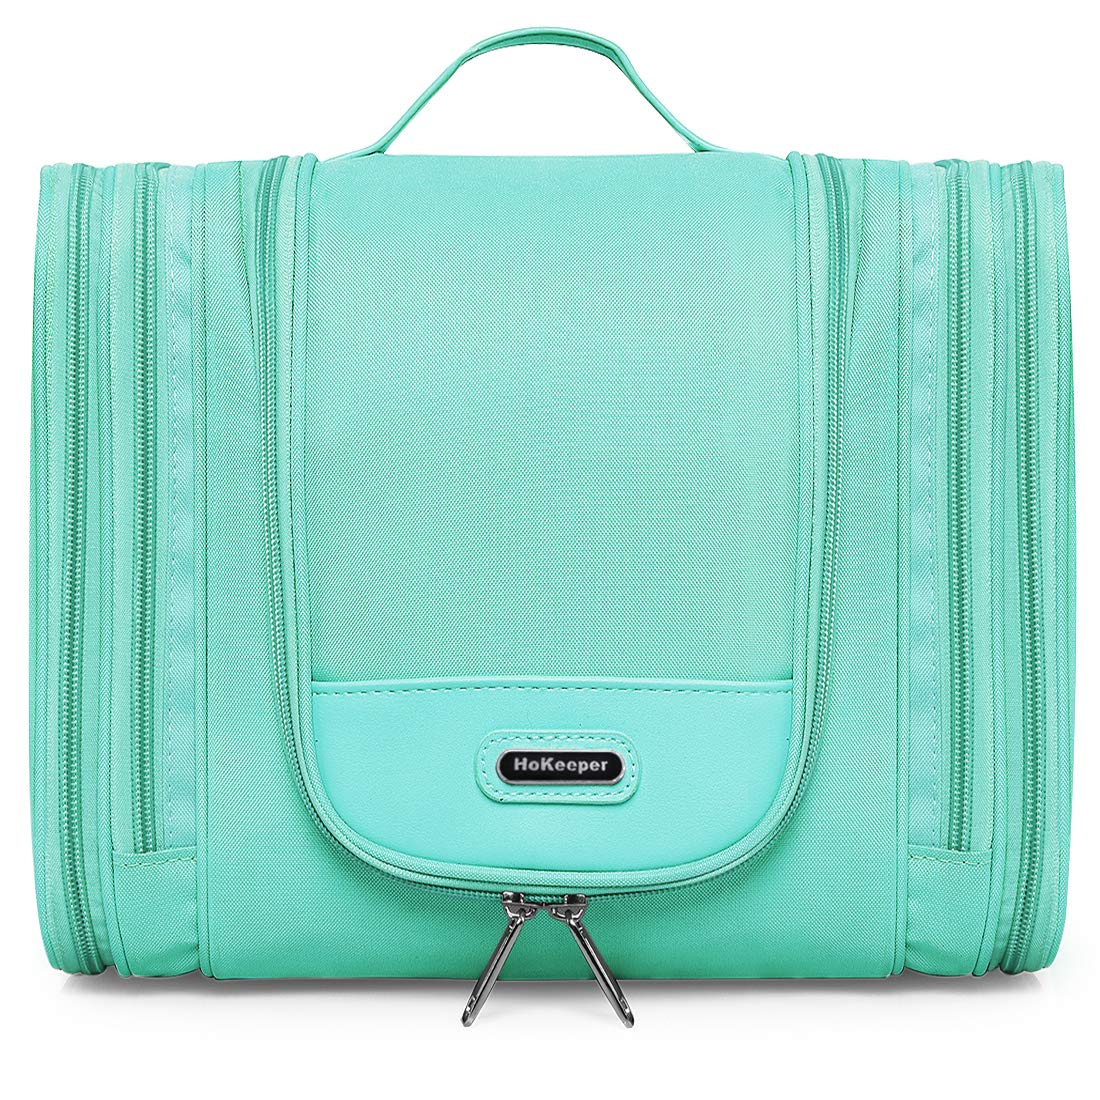 Heavy Duty Waterproof Toiletry Bag – Travel Cosmetic Makeup Bag for Women Shaving Kit Organizer Bag for Men – X Large Size 11.5 x 4.5 x 9.5 Inch Aquamarine